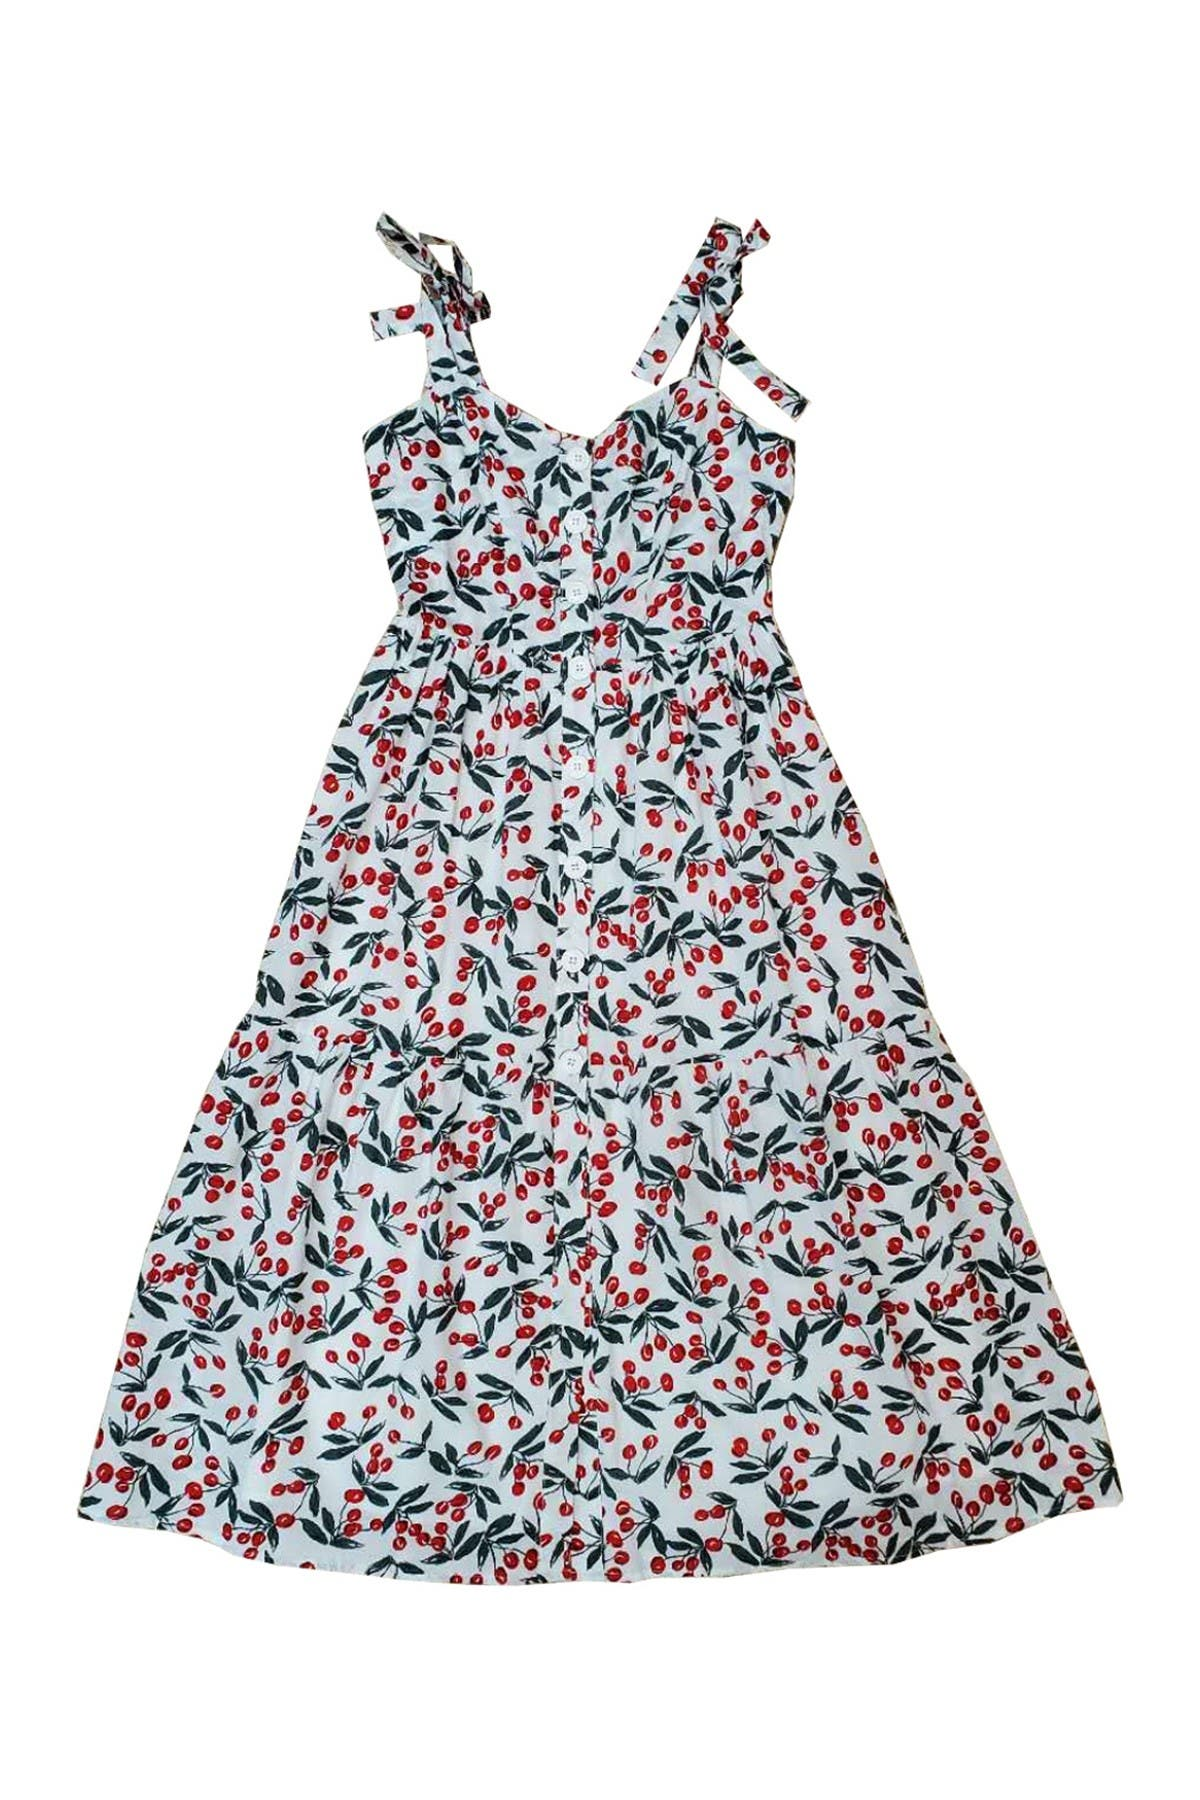 Image of MELLODAY Tie Shoulder Ditsy Print Midi Dress